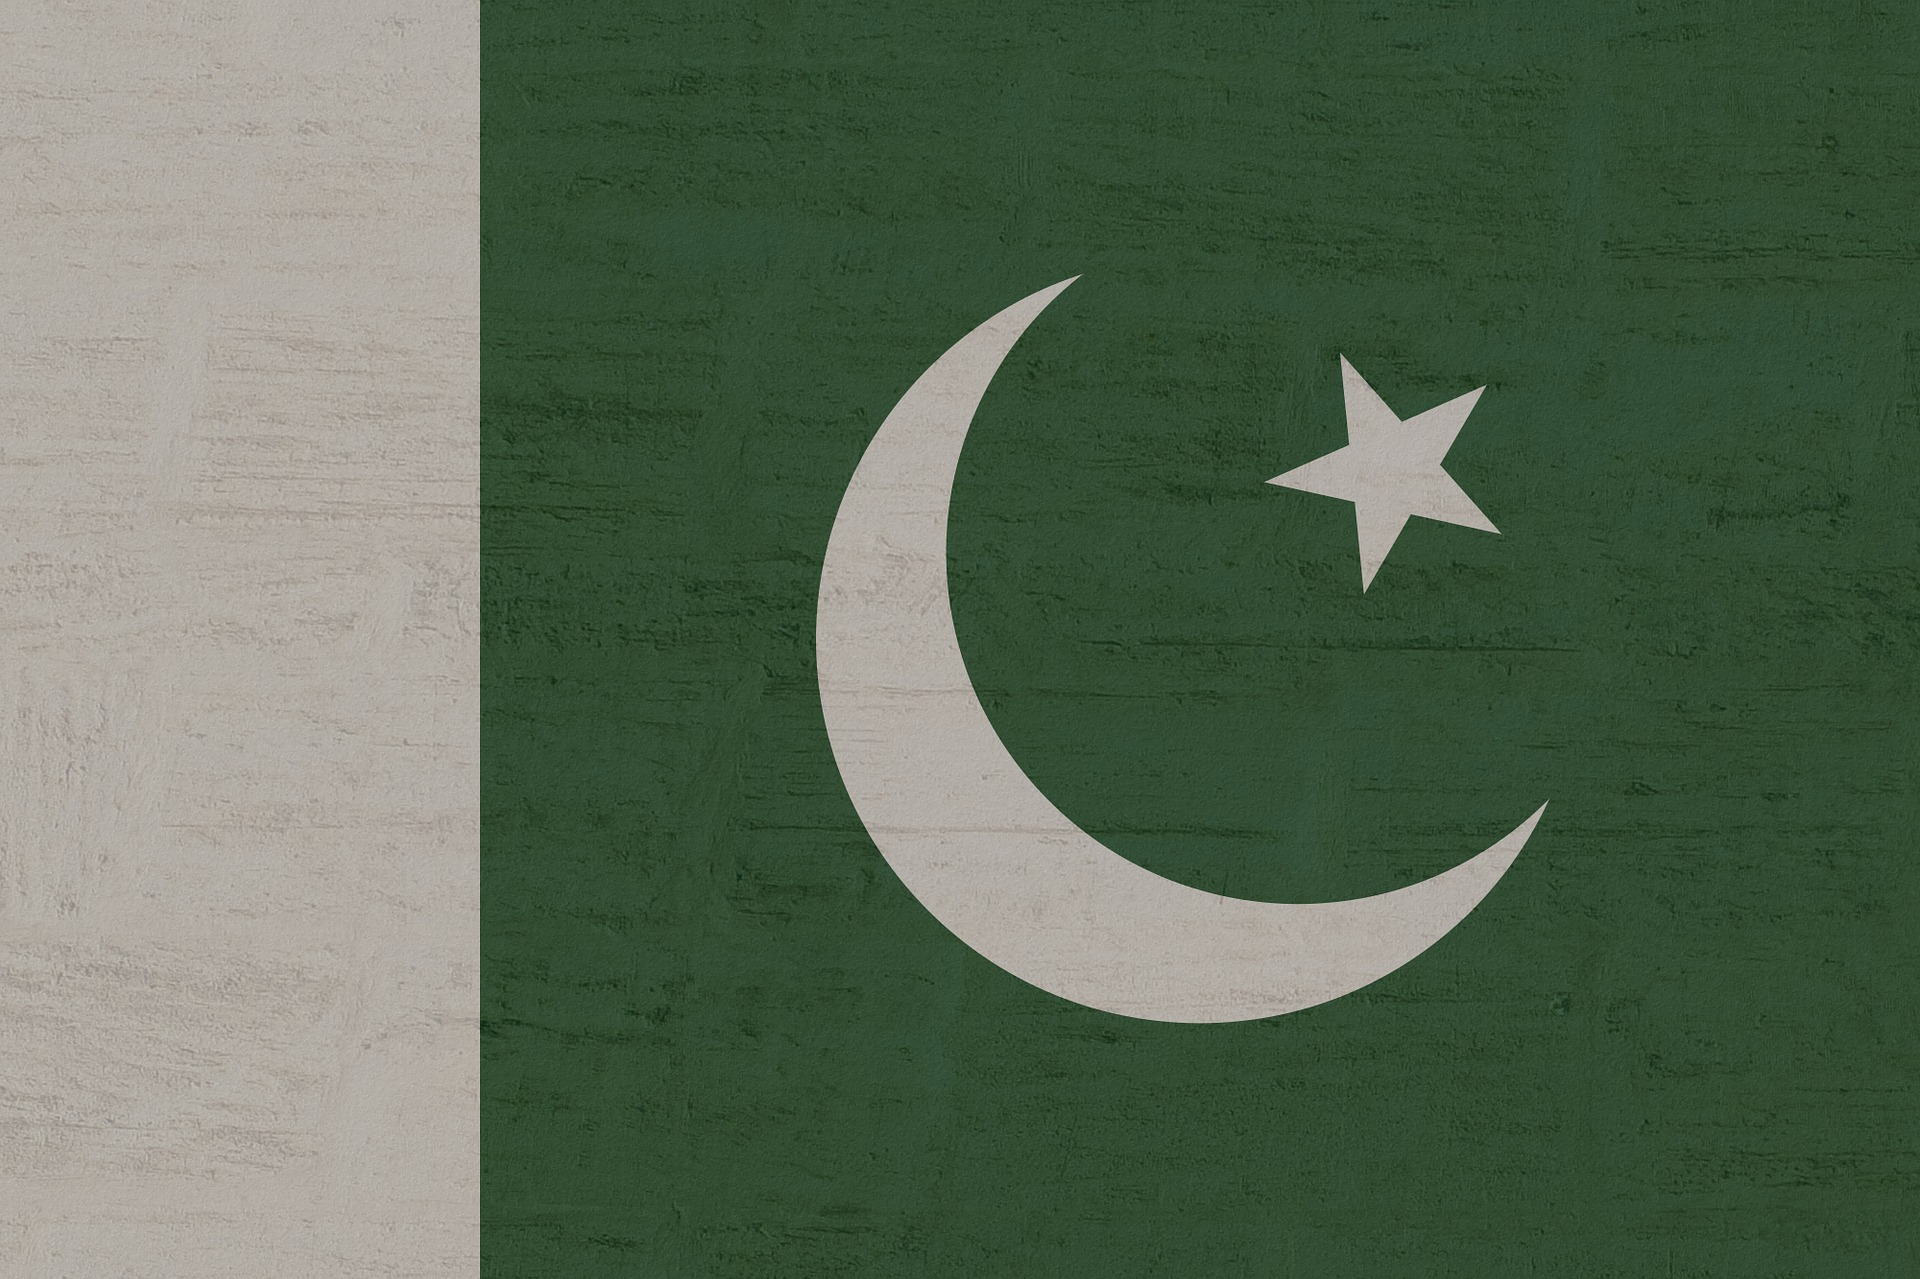 New Keys for Kids partnership in Pakistan